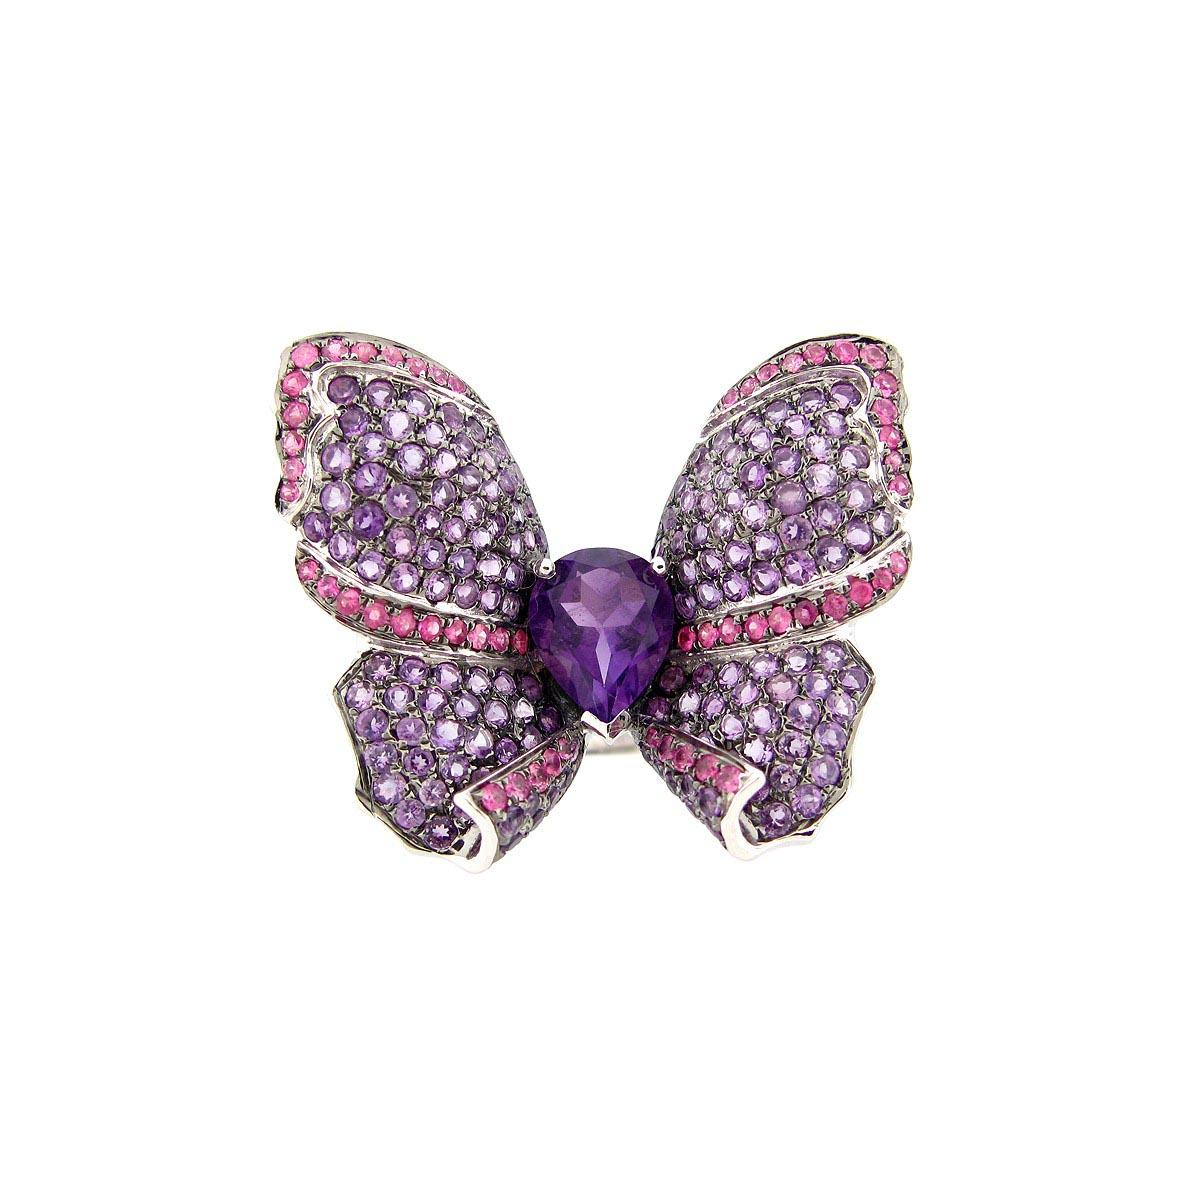 Pink Sapphire & Amethyst Ring